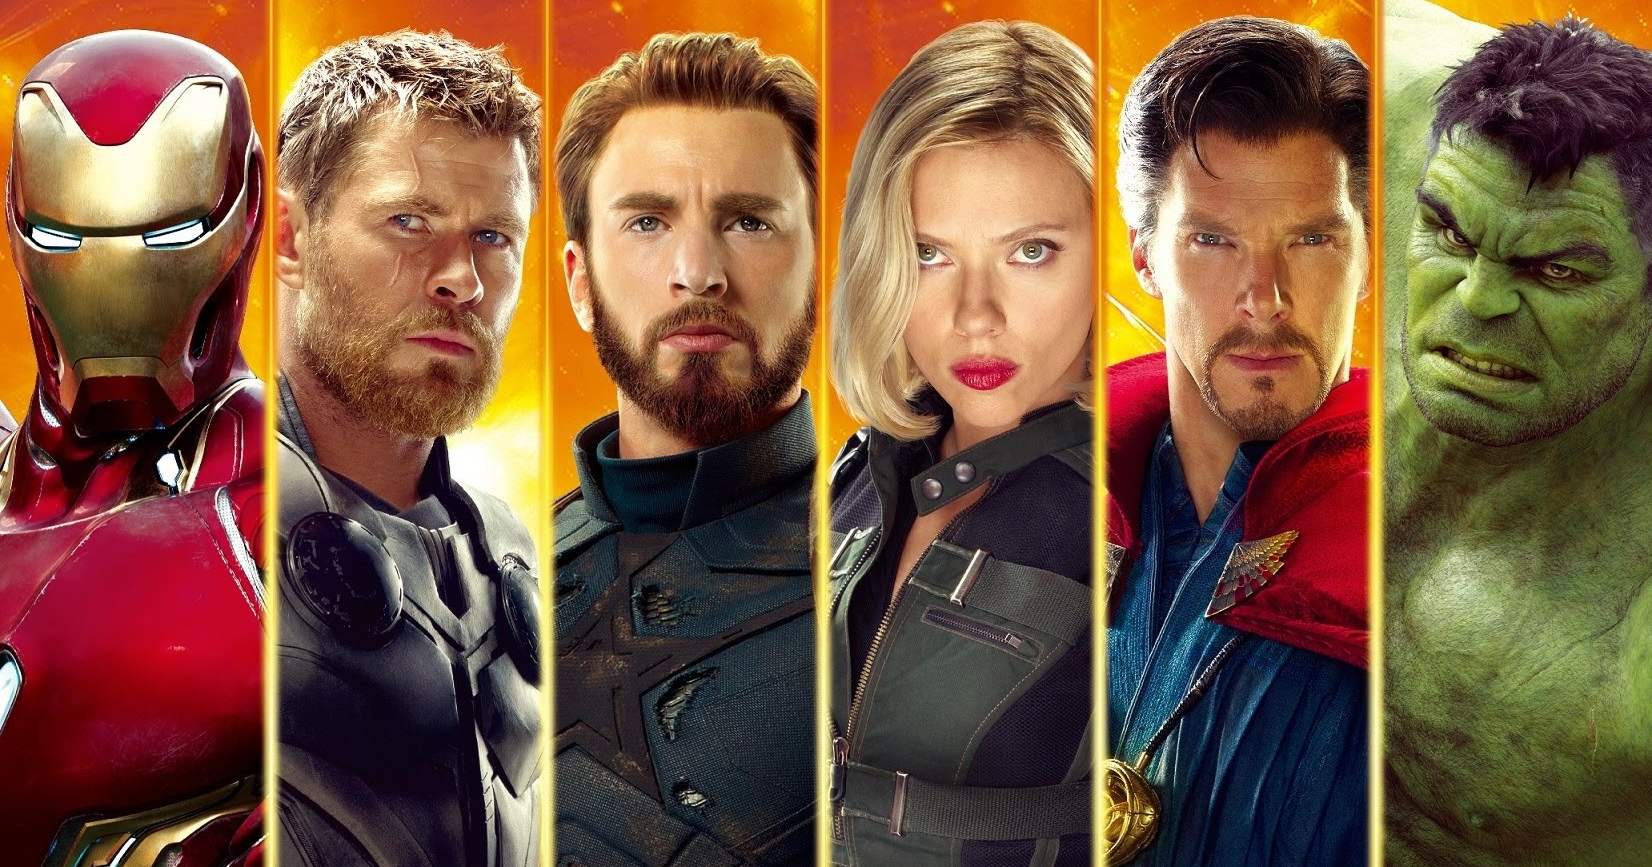 marvel-avengers-infinity-war-tokyo-metro-stamp-rally-poster_1.jpg